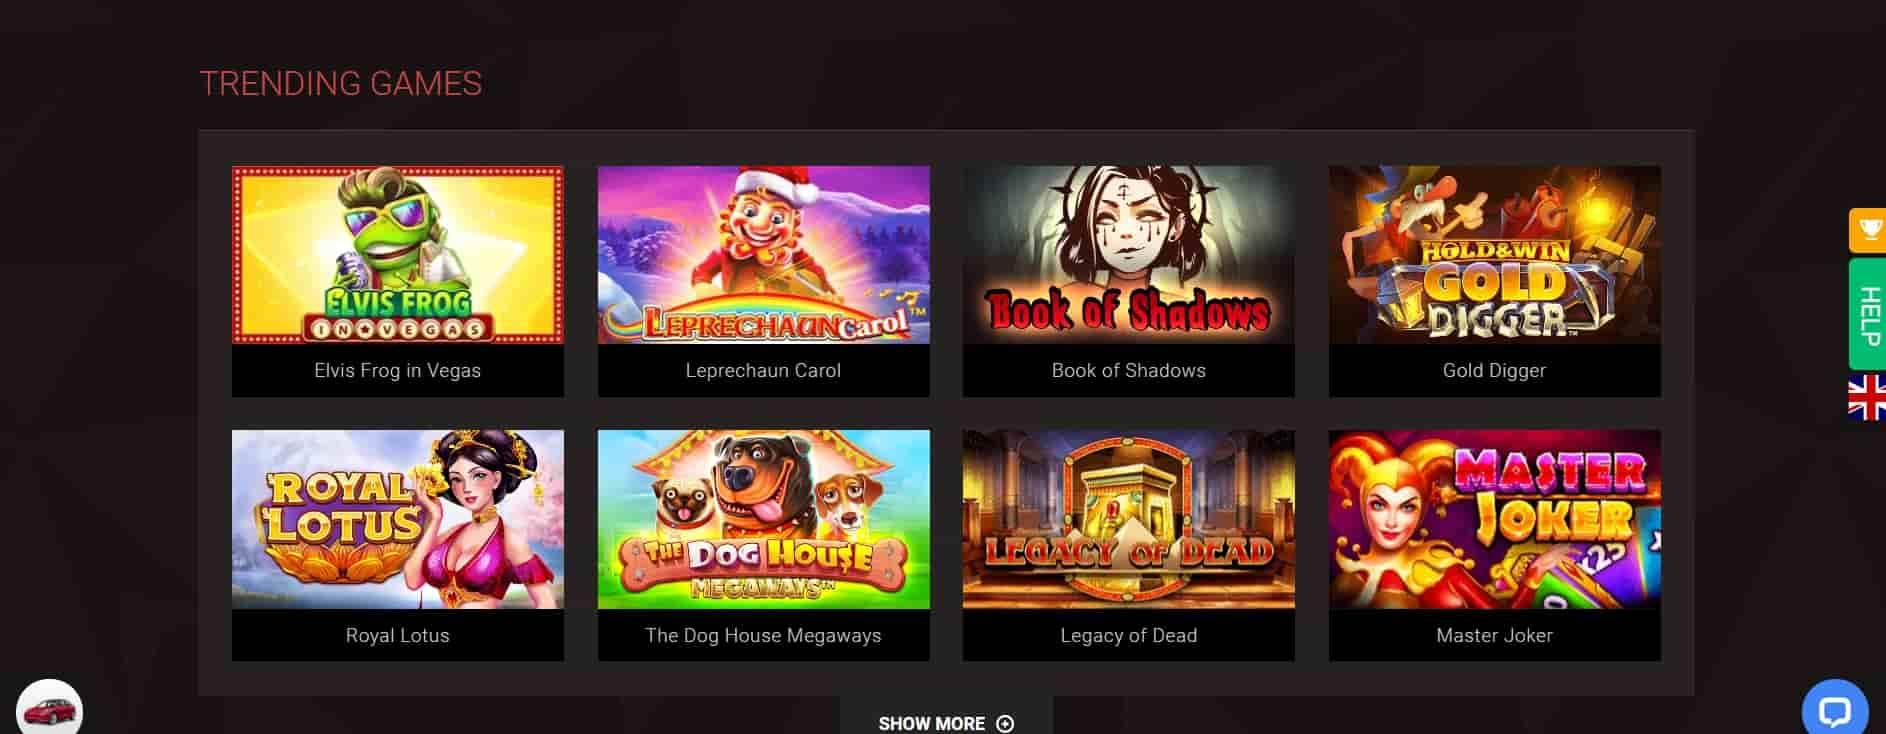 bitstarz casino slot games